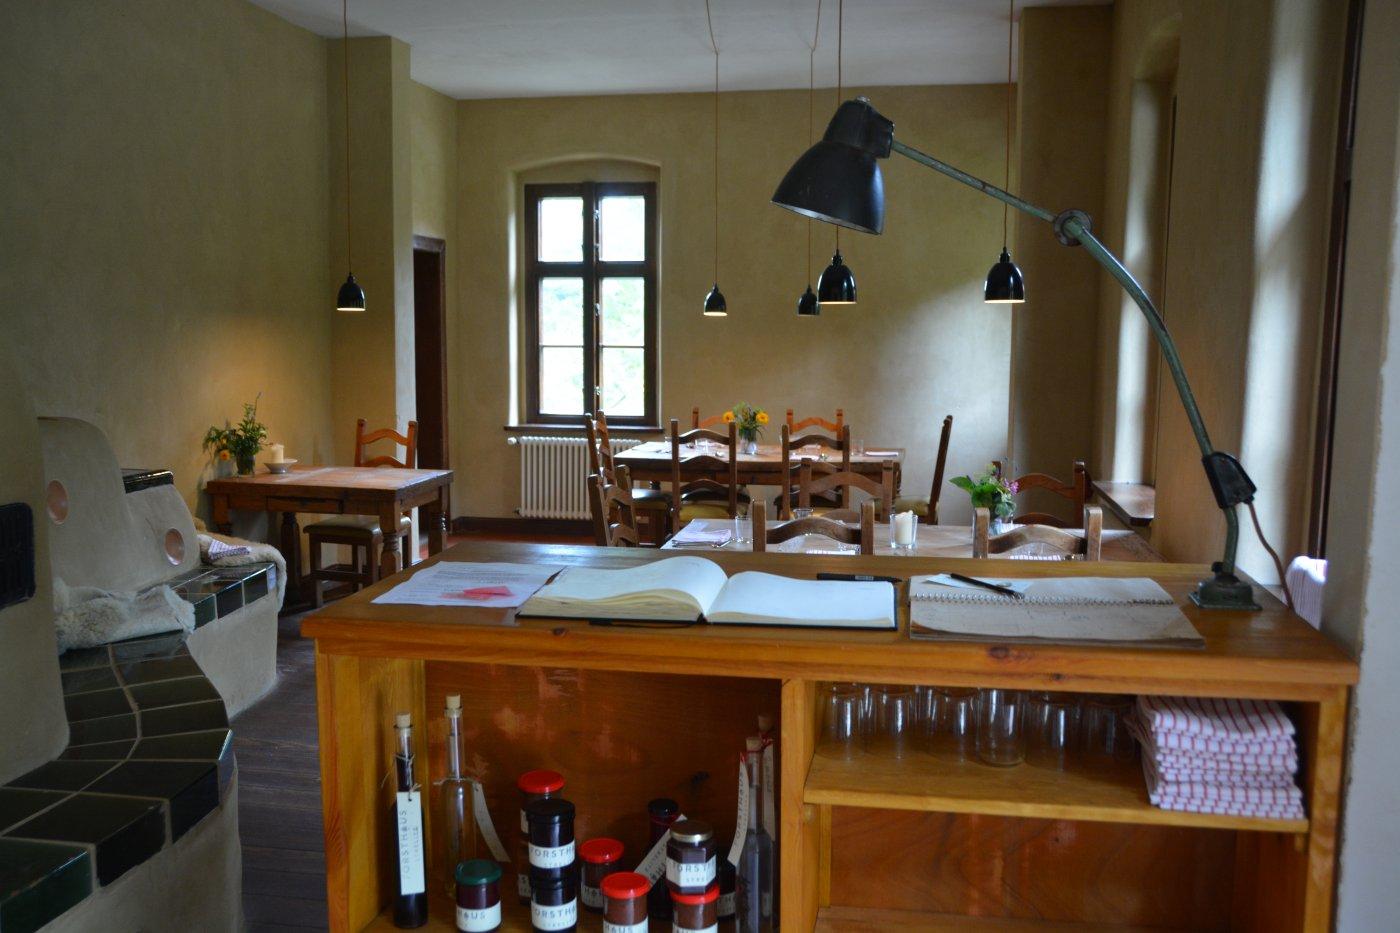 forsthaus-strelitz13